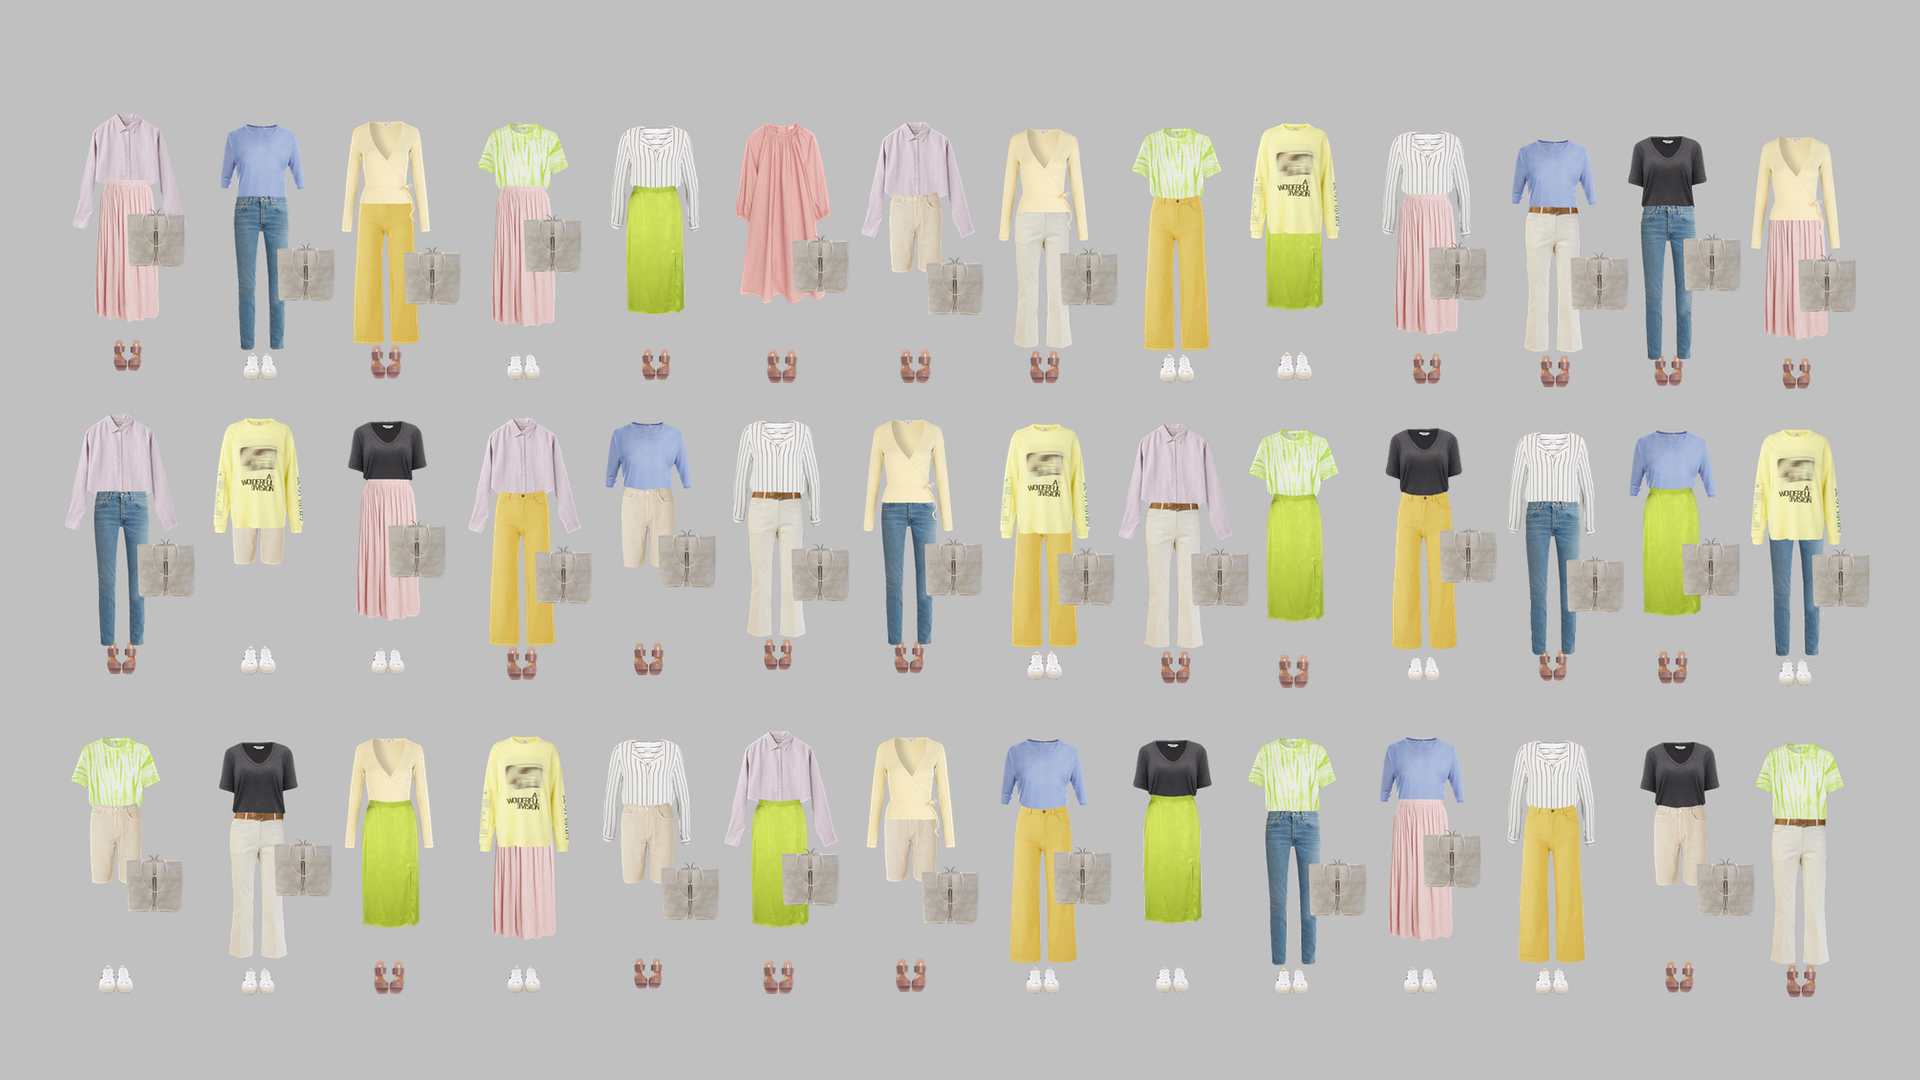 Wonder Wardrobe: 43 outfits.